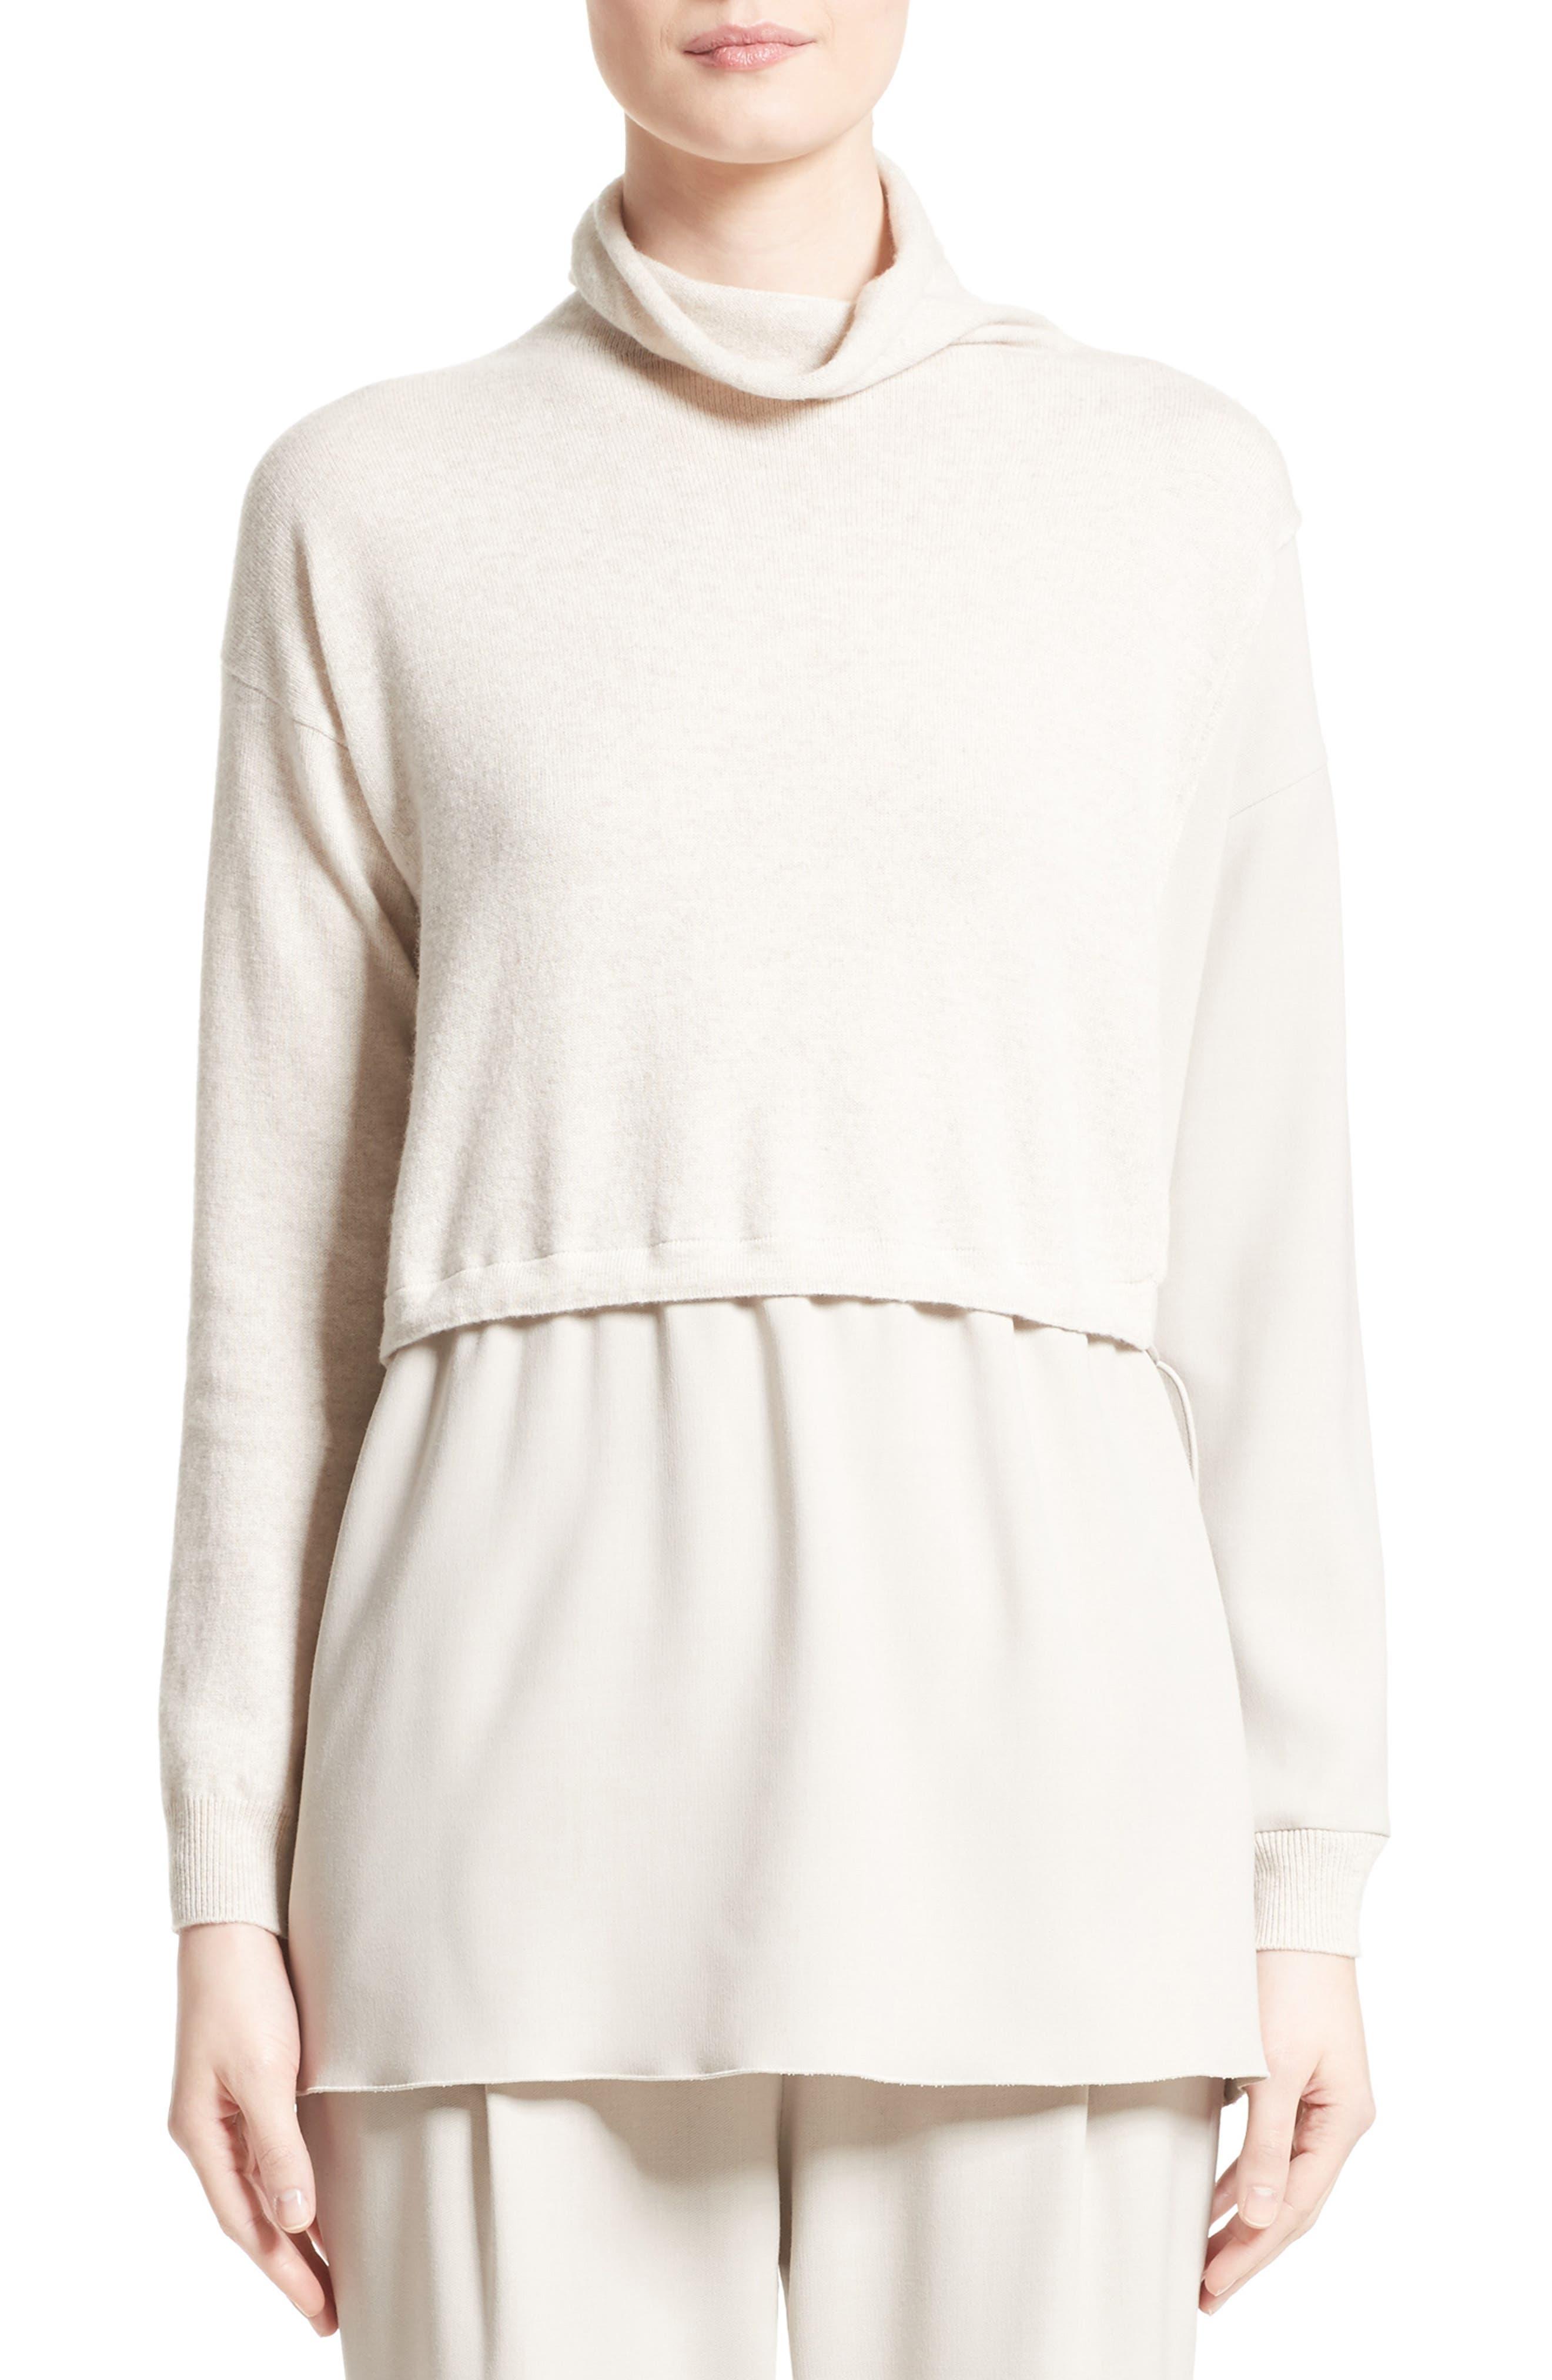 FABIANA FILIPPI Wool, Silk & Cashmere Layered Turtleneck